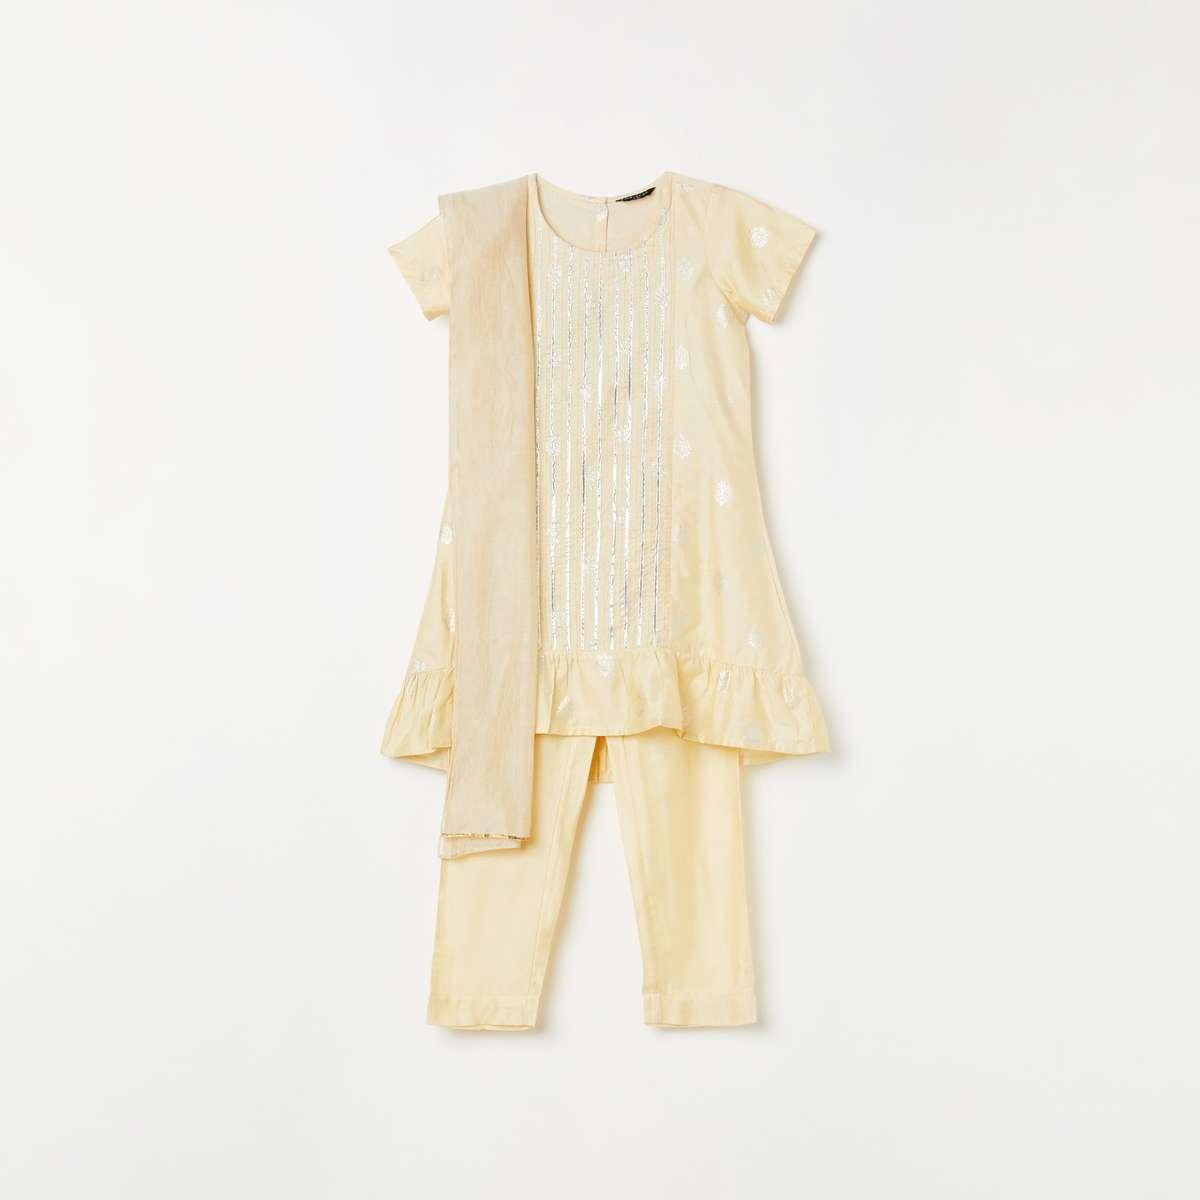 1.MELANGE Girls Foil Print A-line Kurta with Solid Pants and Dupatta